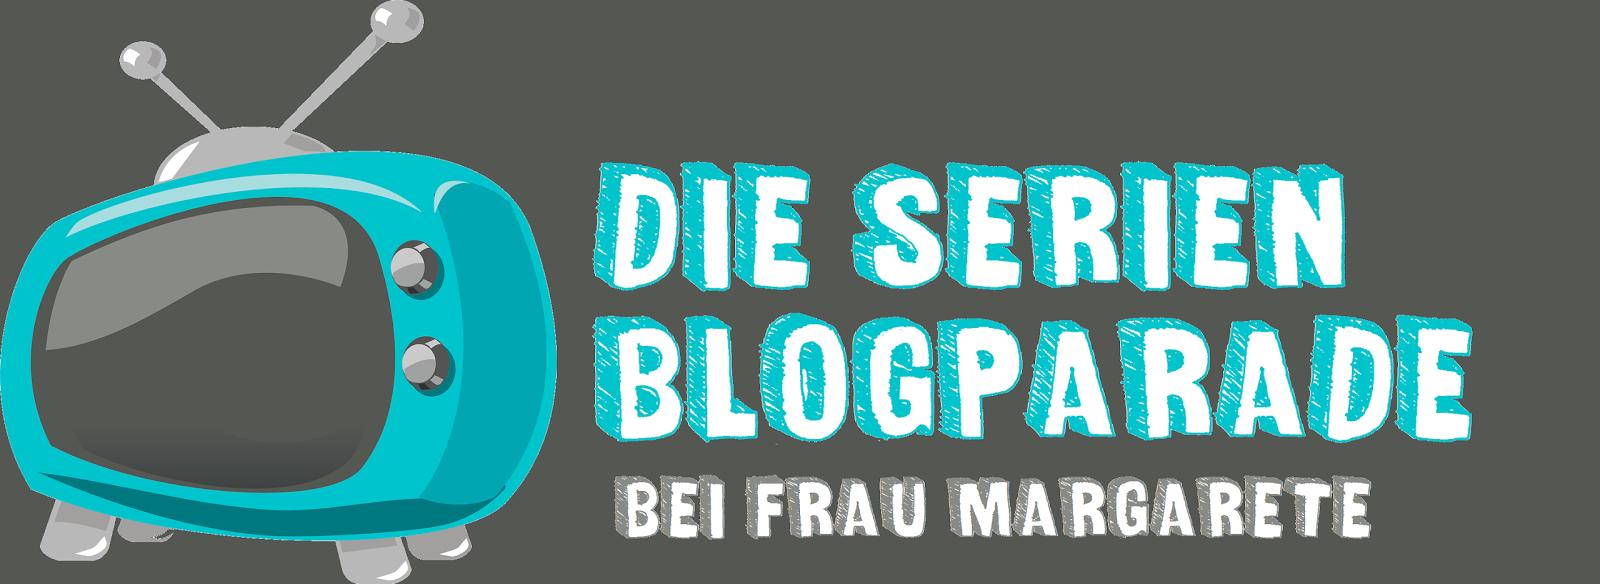 Die Serien-Blogparade bei Frau Margarete